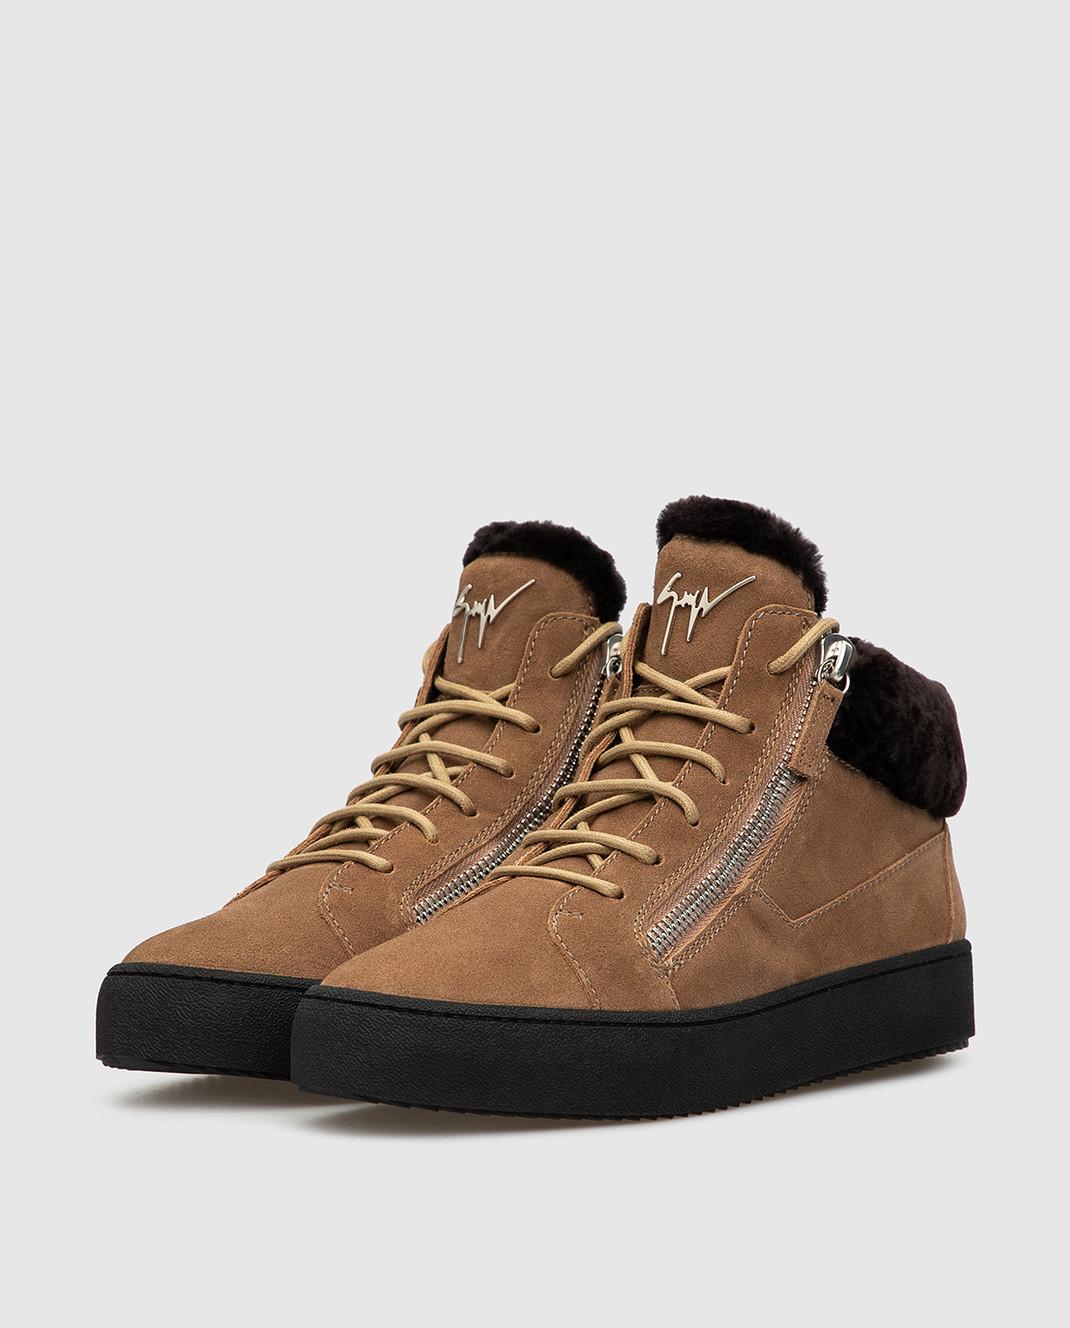 Giuseppe Zanotti Бежевые замшевые ботинки изображение 3